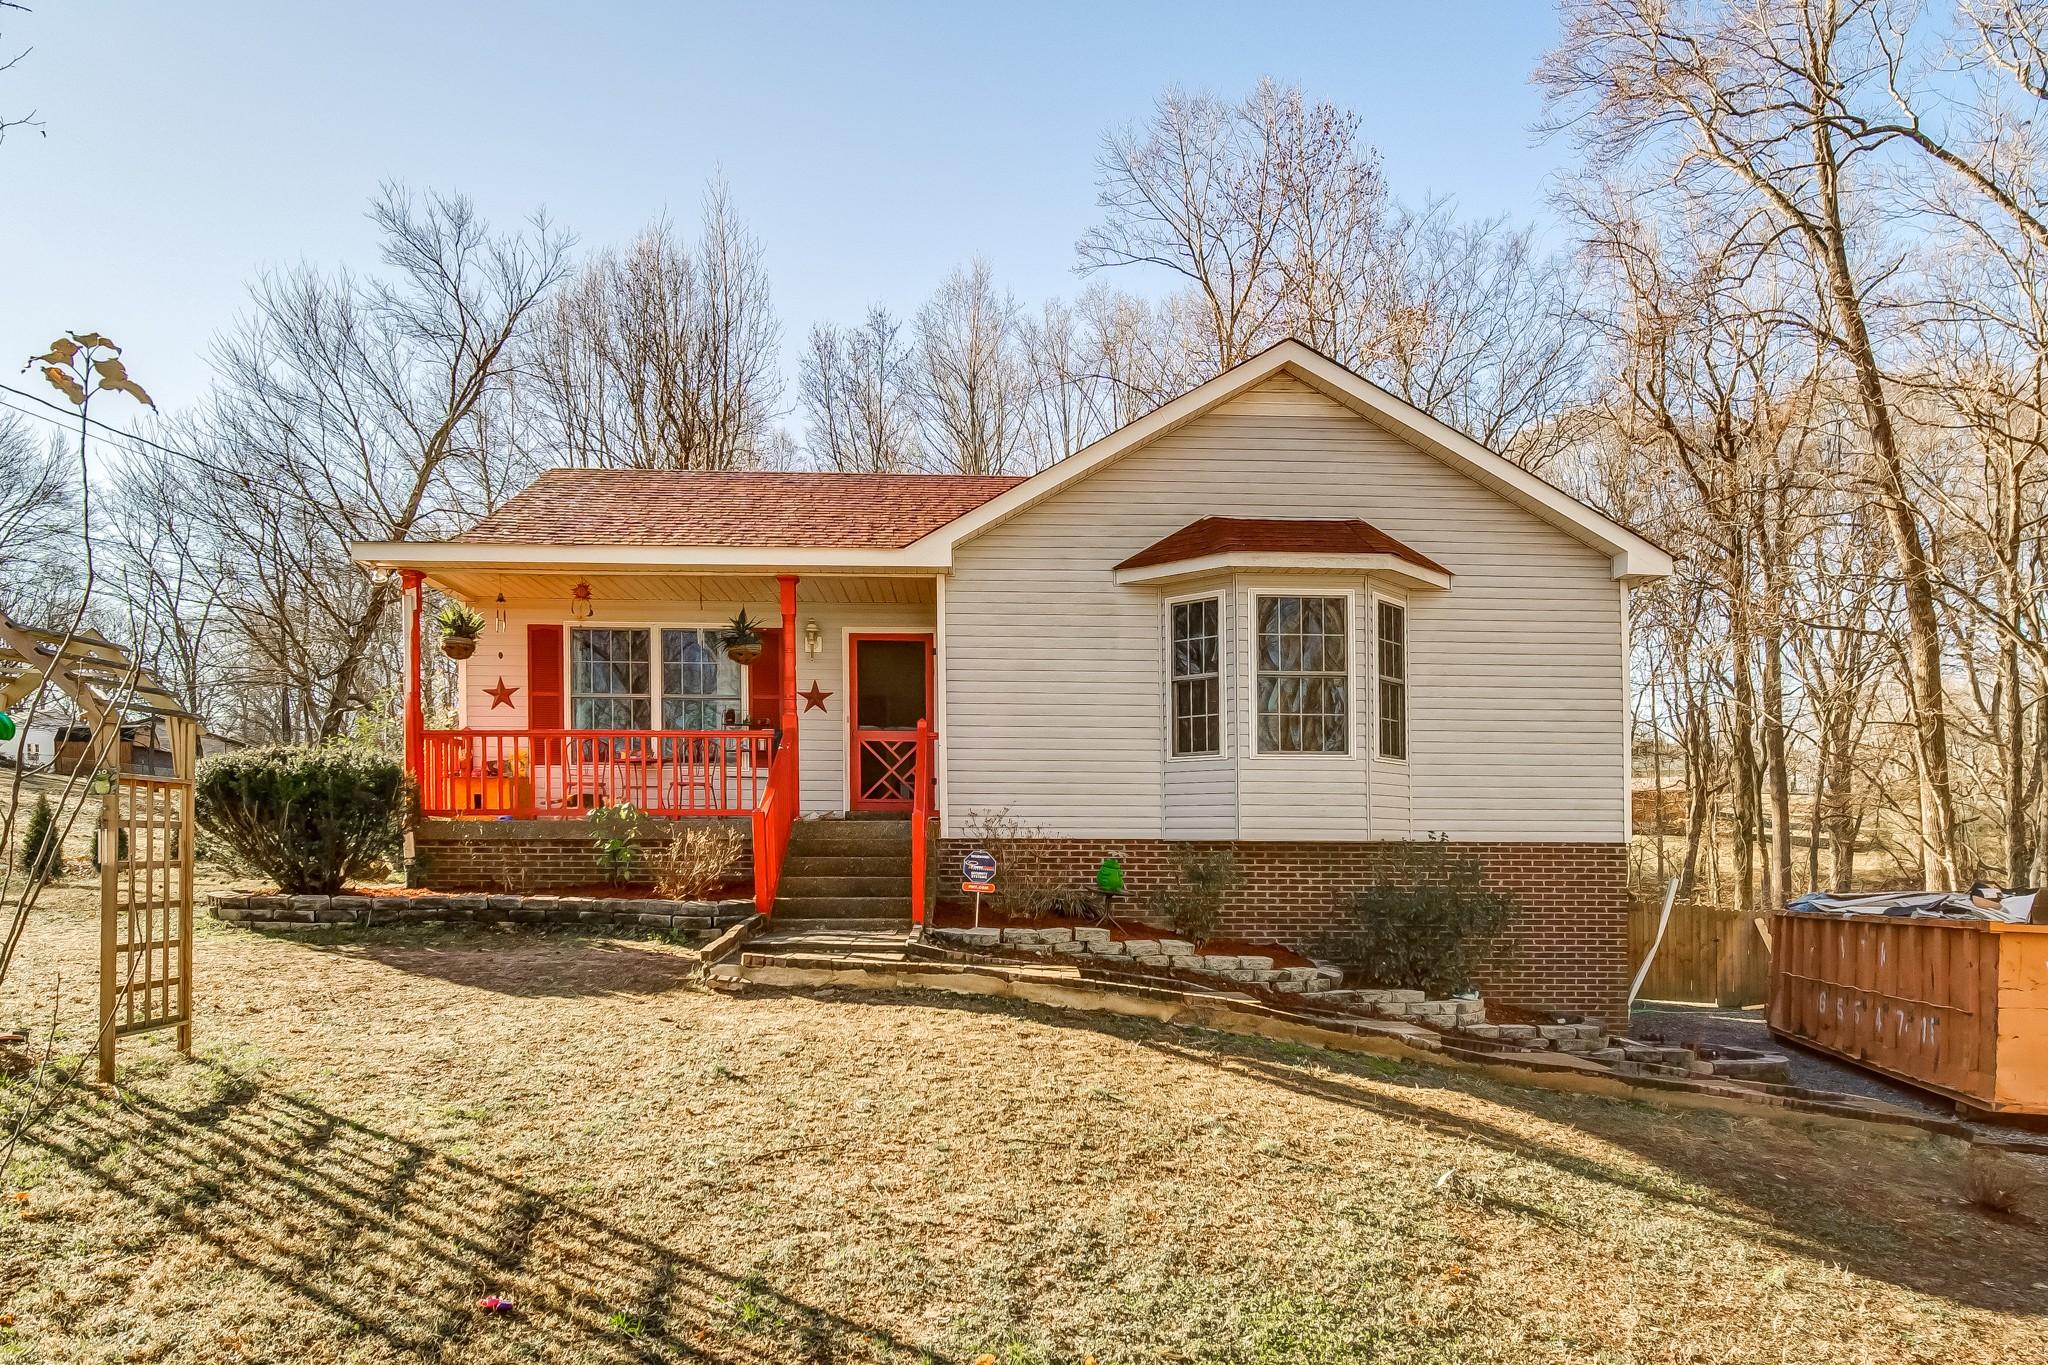 1143 Morriswood Dr, Joelton, TN 37080 - Joelton, TN real estate listing